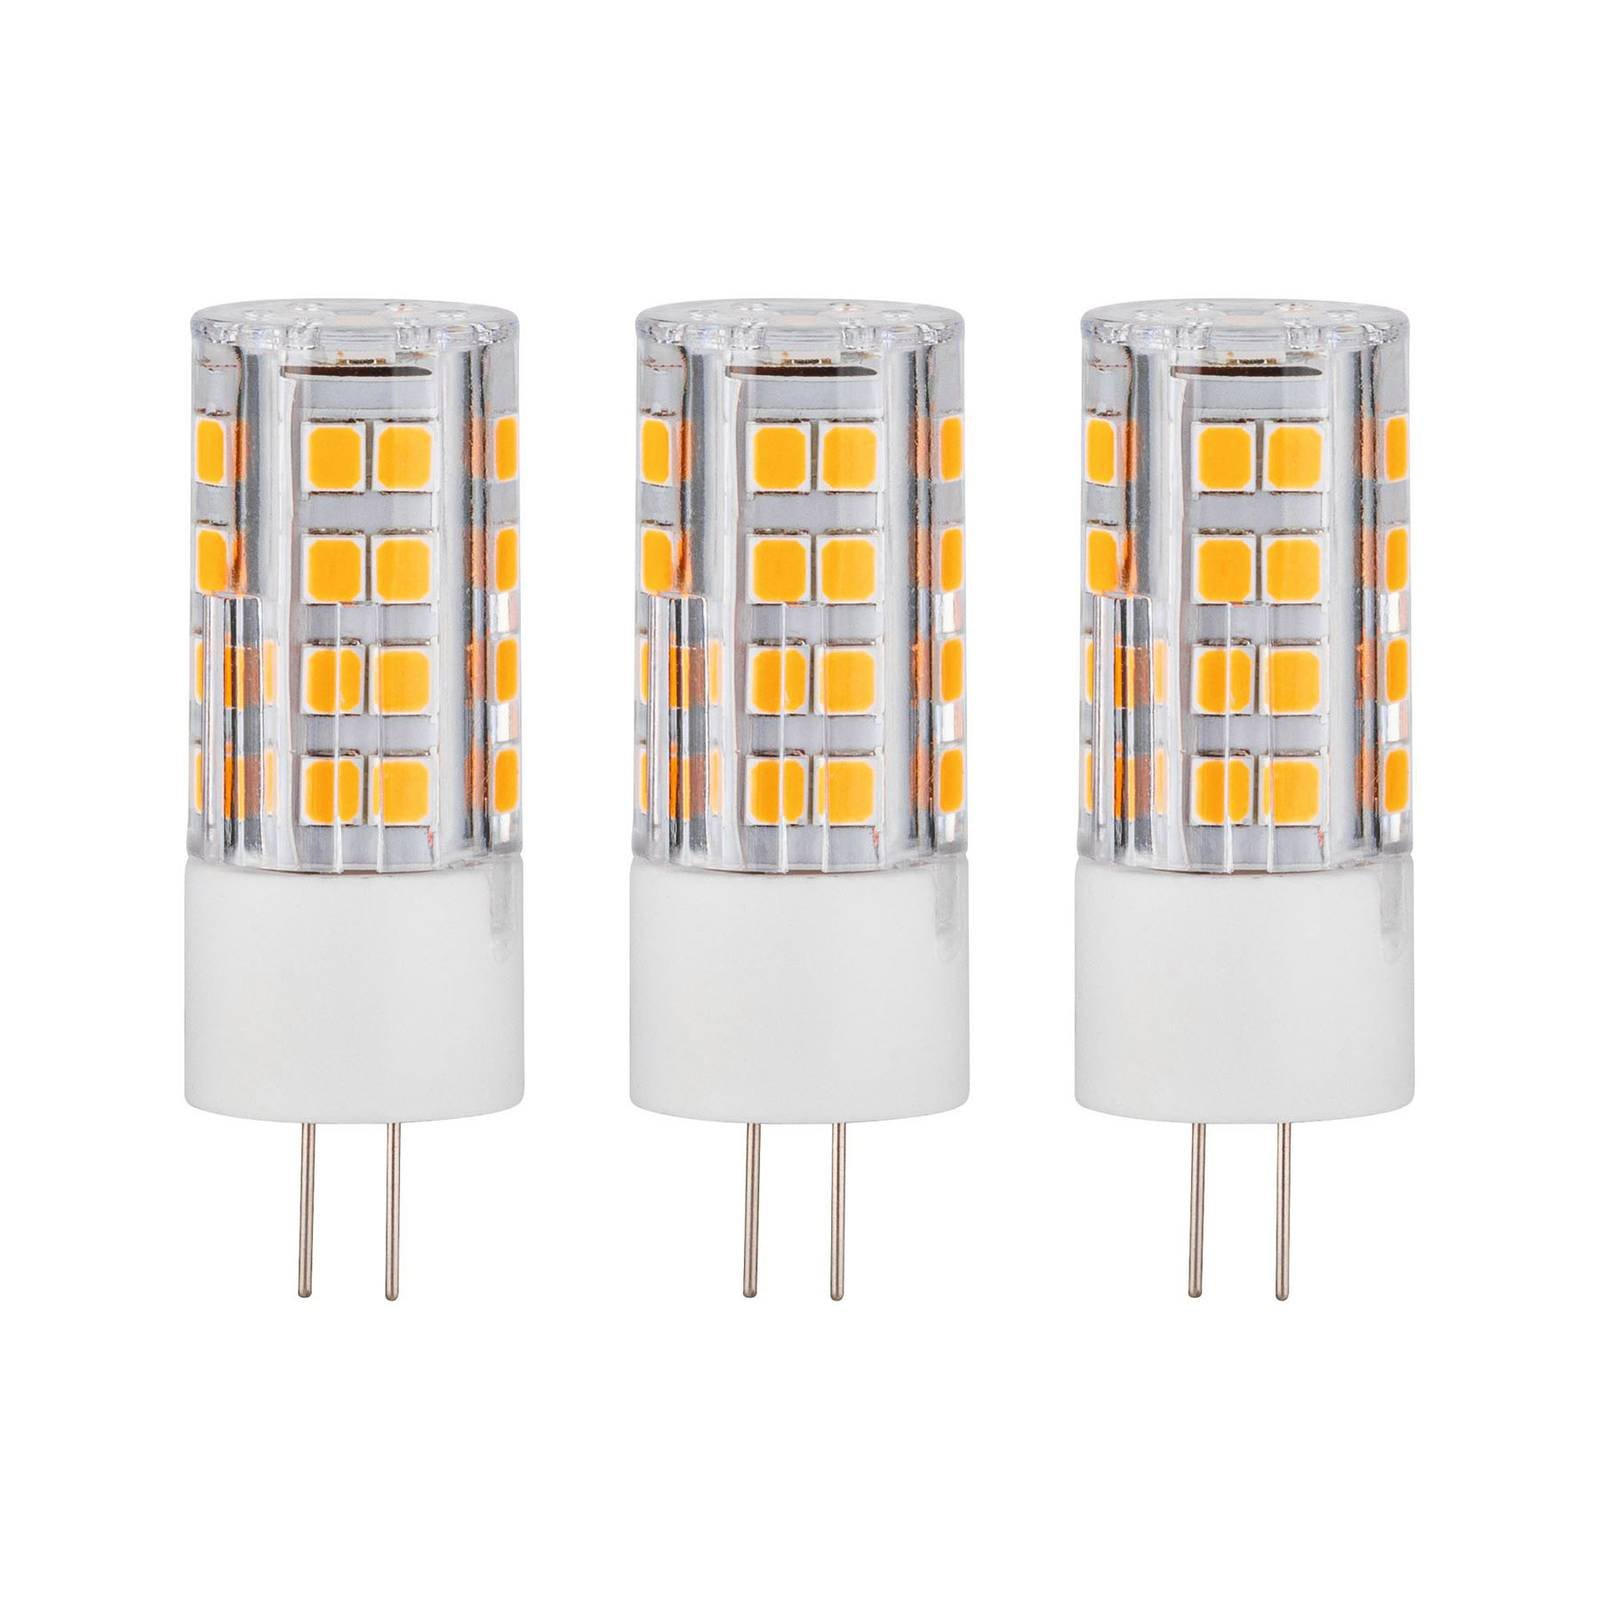 Paulmann 2-kantainen LED-lamppu G4 3W 2700K 3 kpl